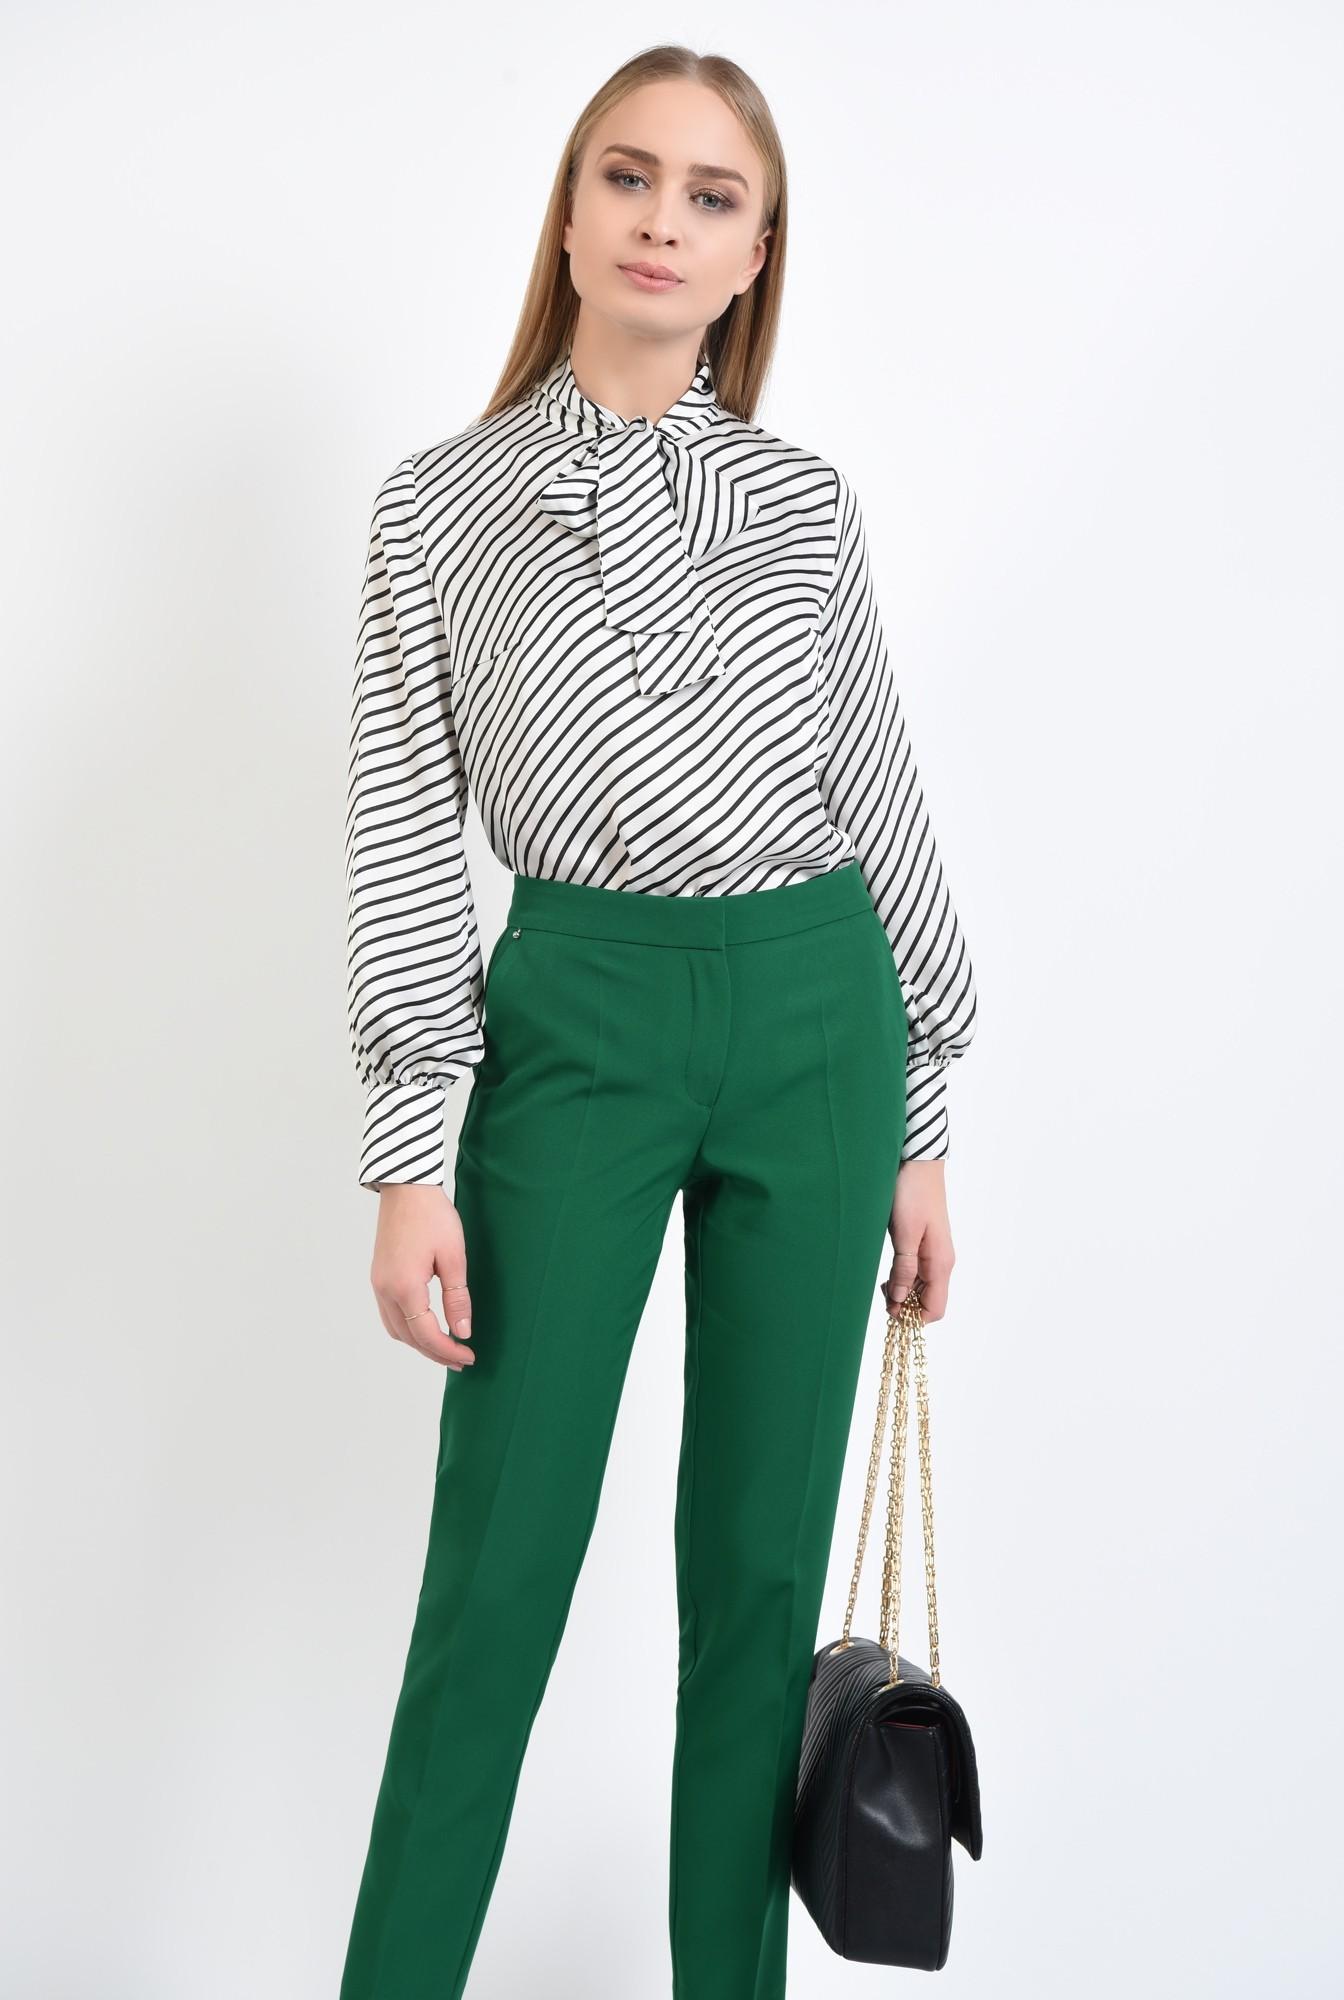 0 - 360 - bluza de zi, cu funda, dungi alb-negru